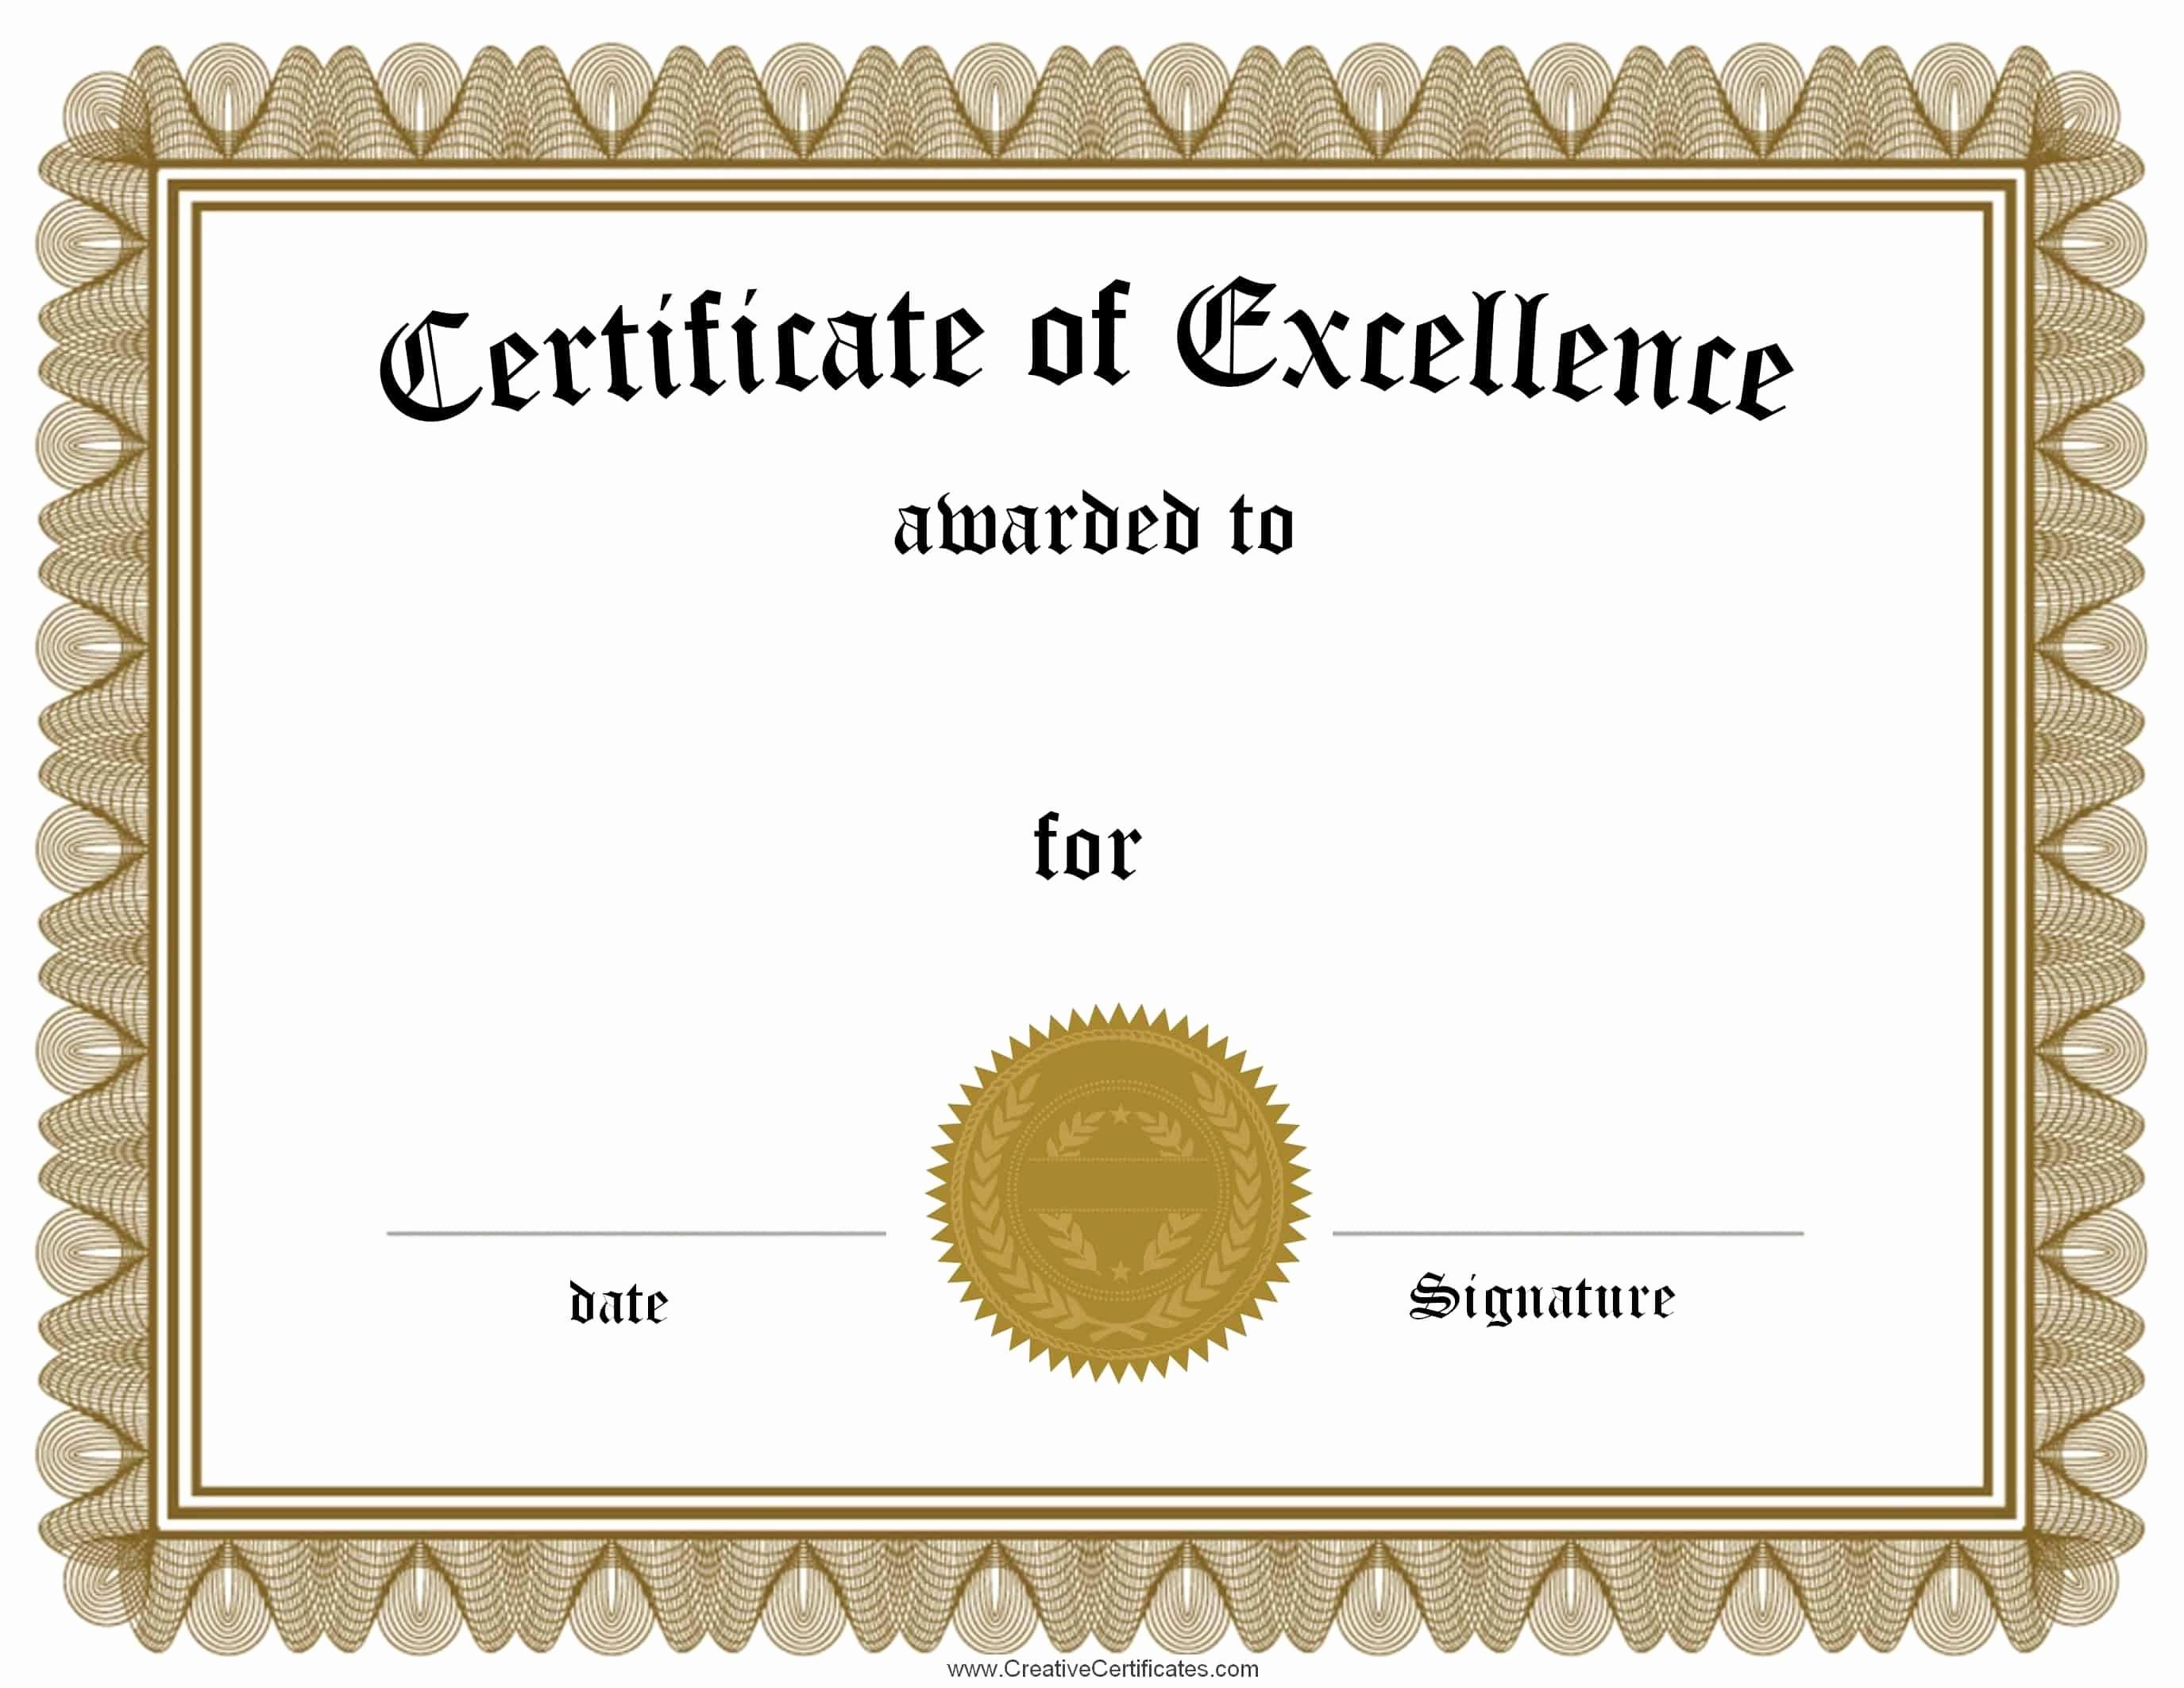 Certificate Design Templates Free Download Beautiful Free Customizable Certificate Of Achievement